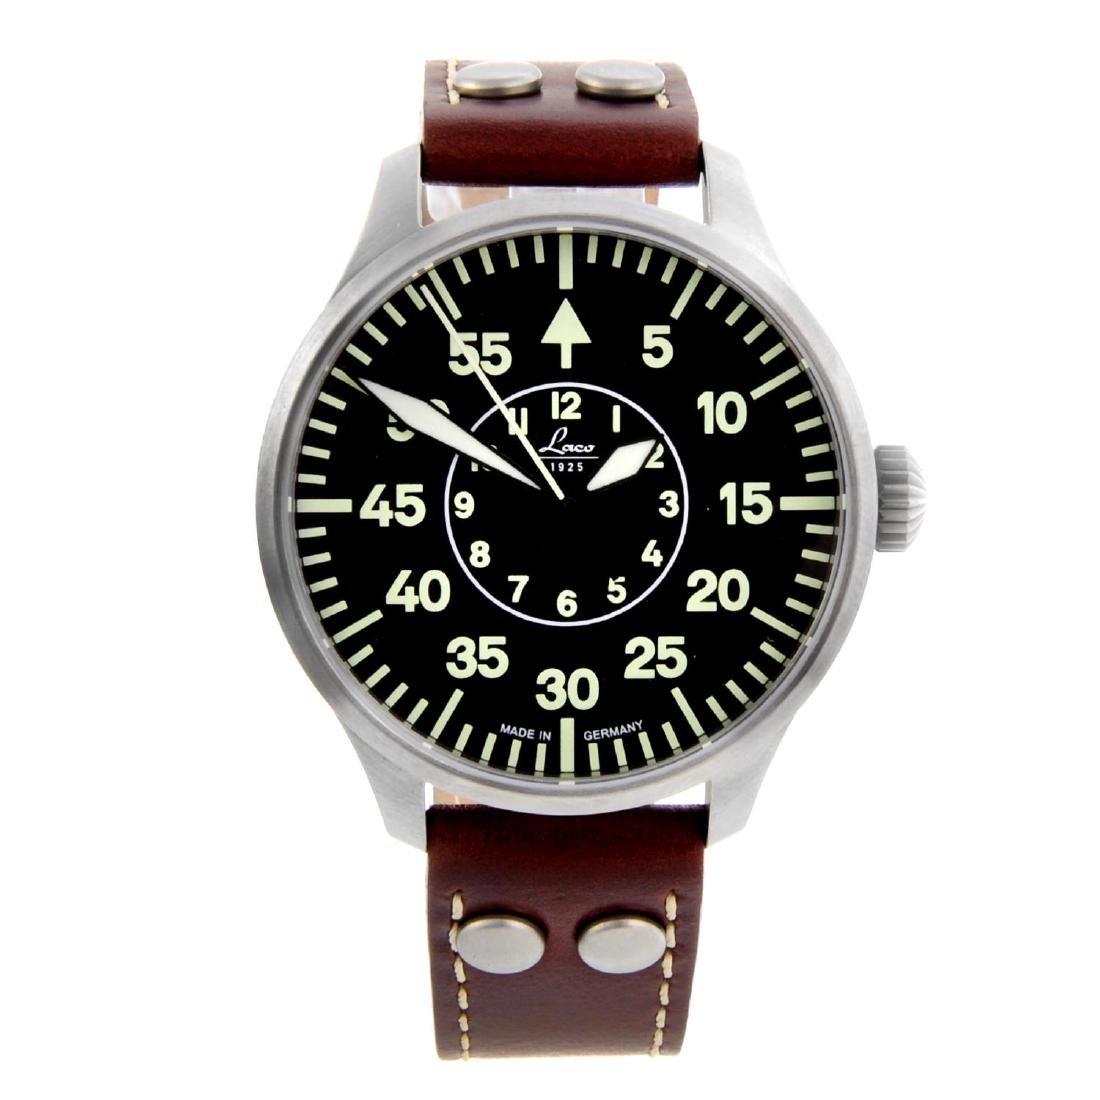 LACO - a gentleman's Aachen 39 wrist watch. Stainless